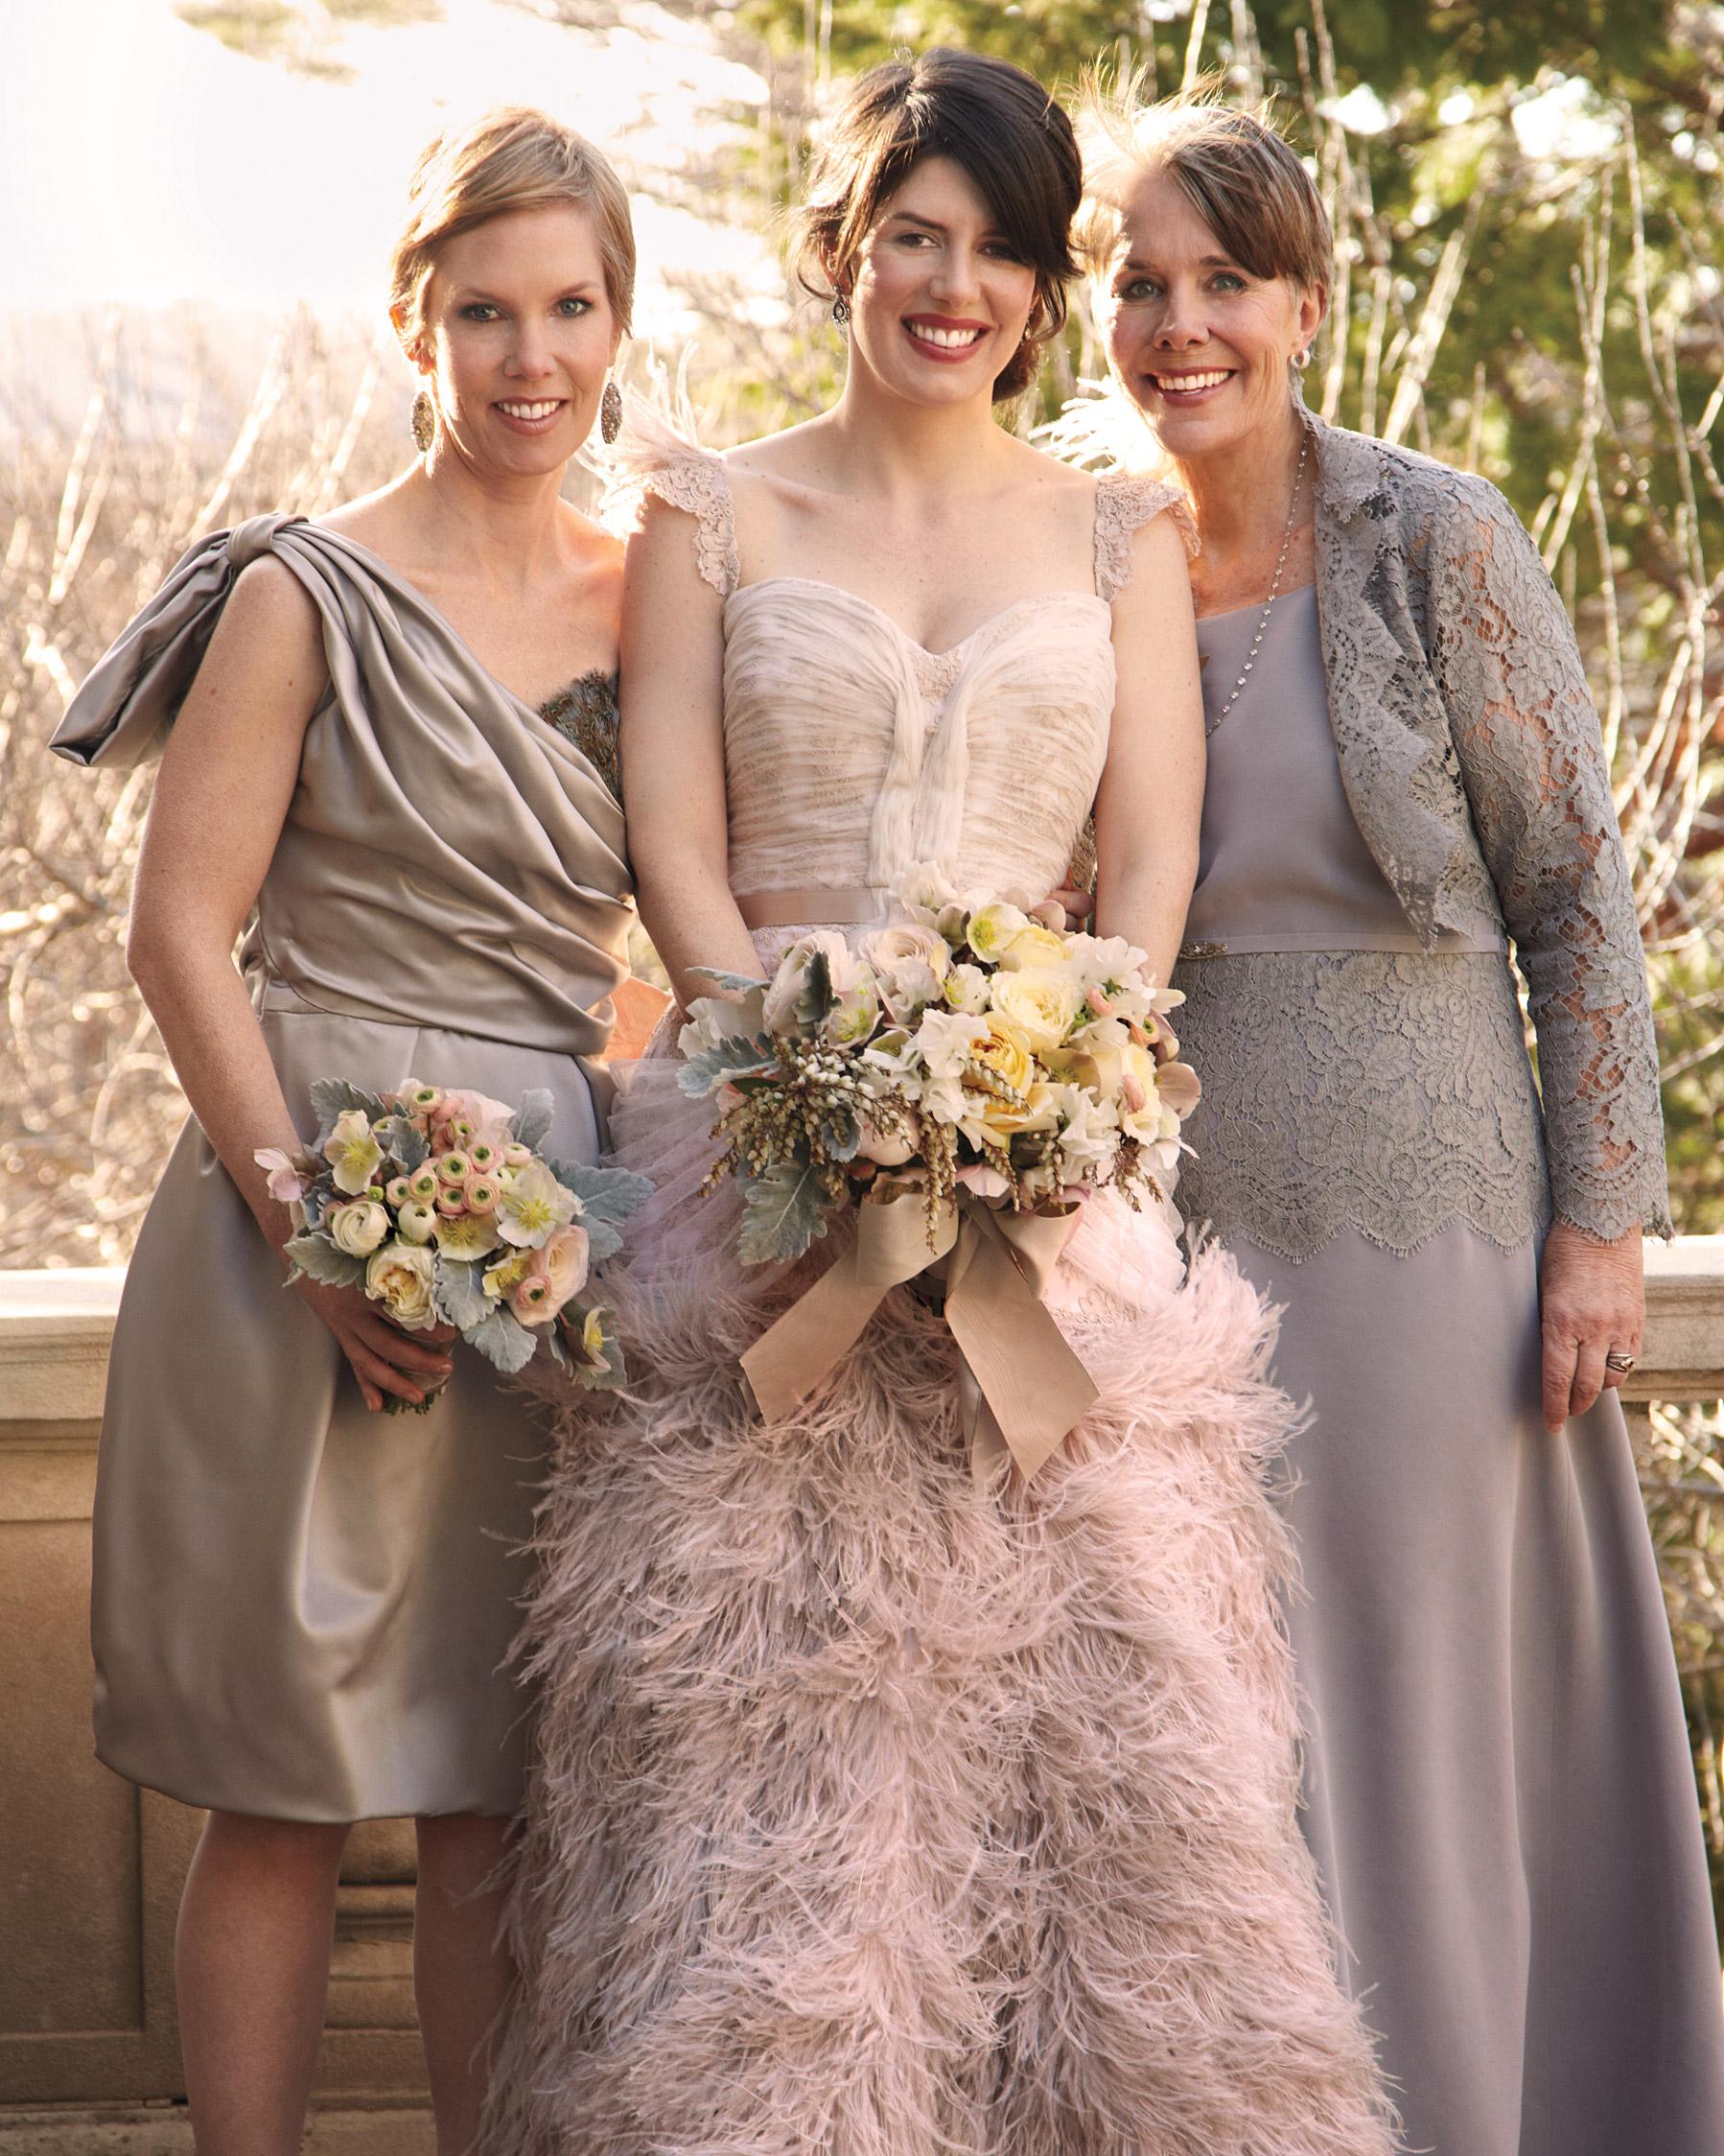 bride-family-0811mwd107282.jpg